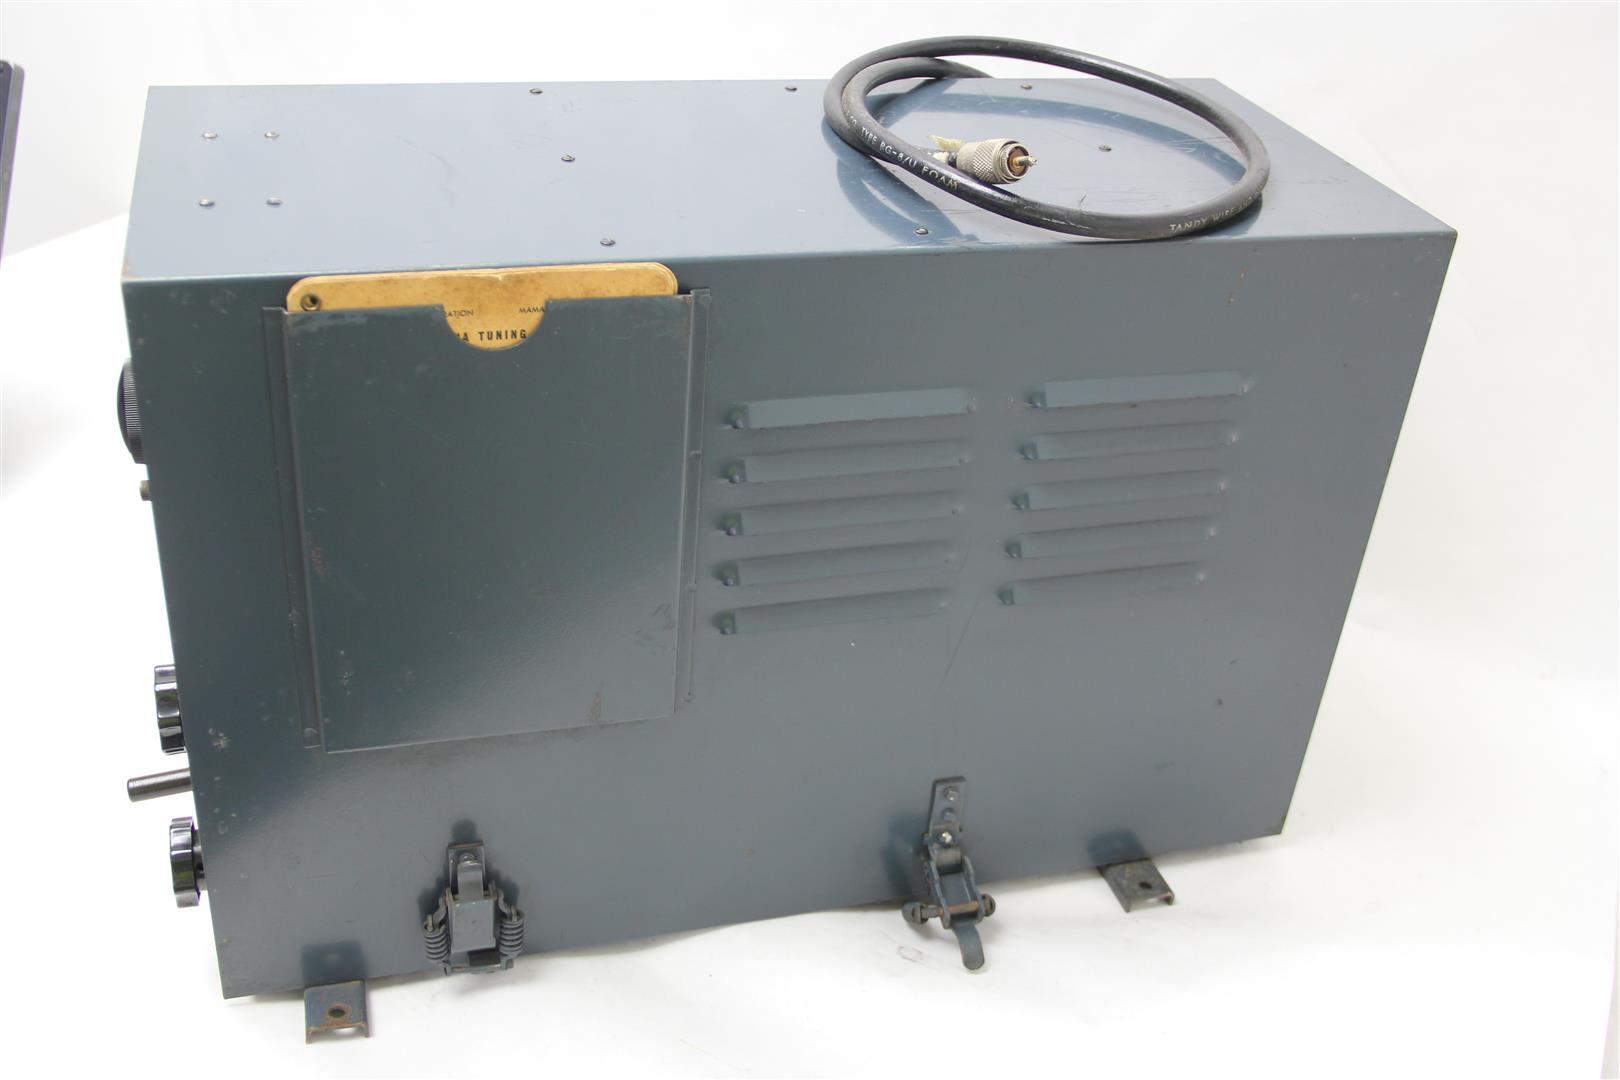 Tmc Antenna Tuning Unit Tac Legal Limit Manual Tuner 2 30 Megacycles Ham Radio